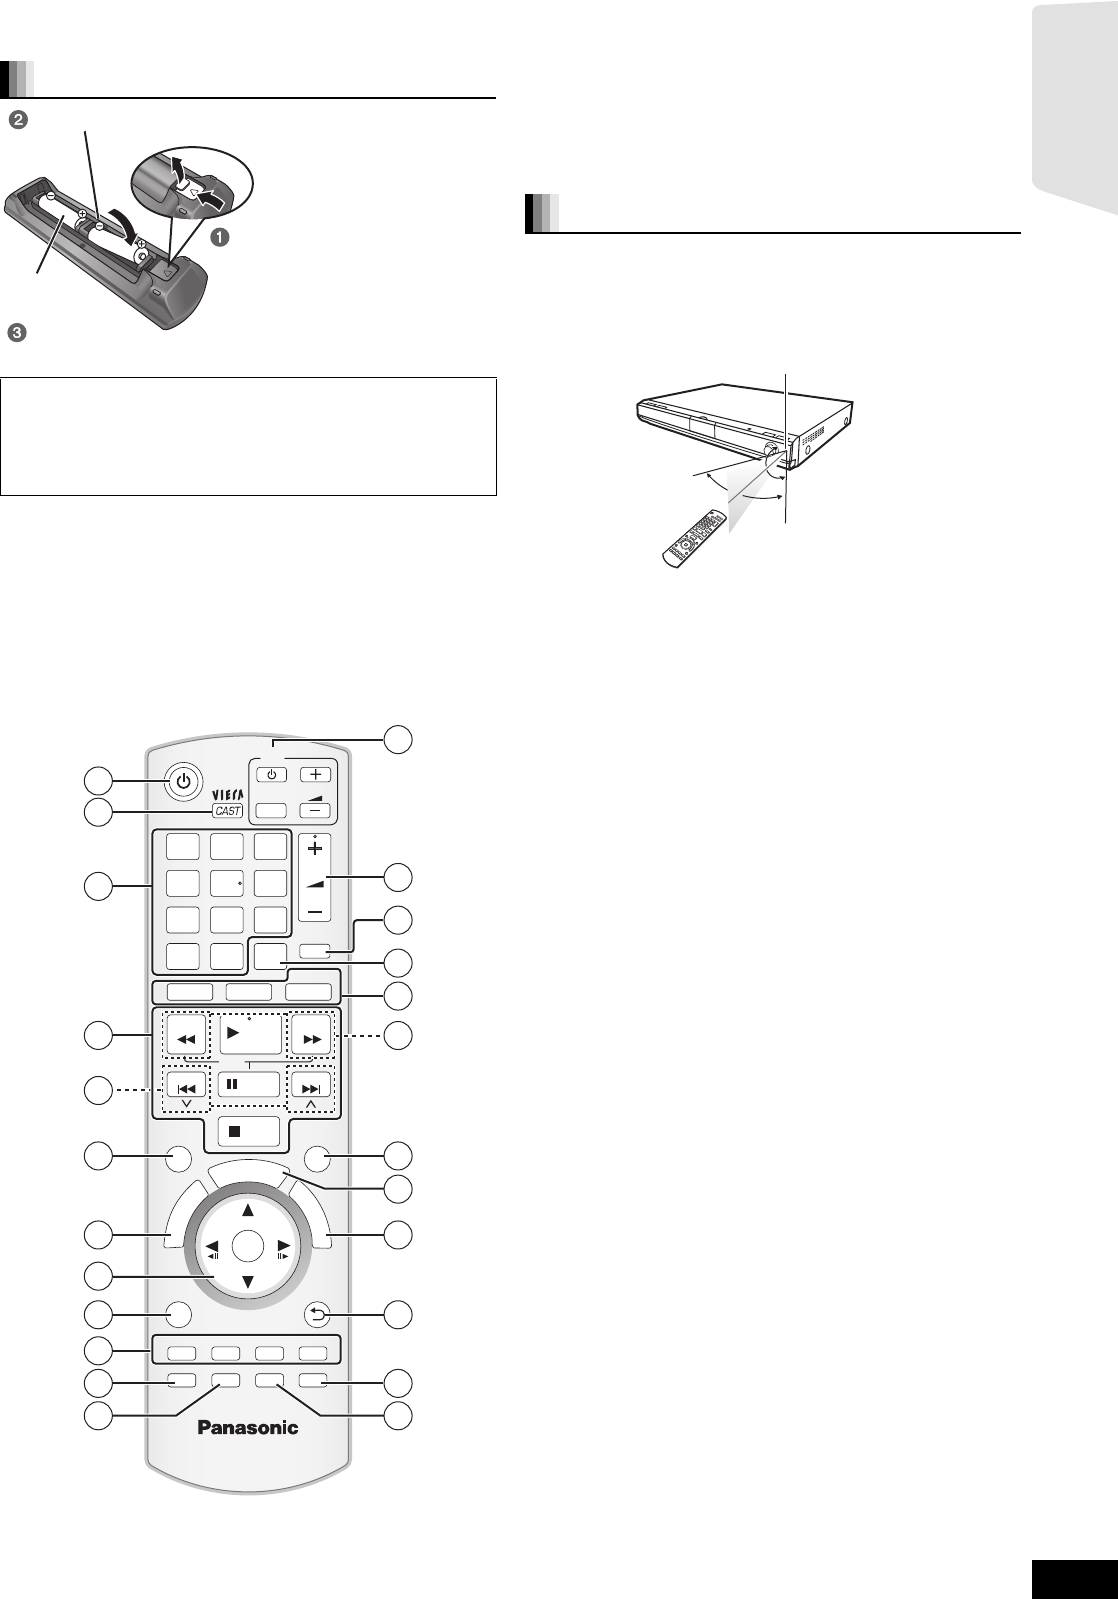 Pdf Sc Bt205 Nason Low Pressure Switch Diagram Free Download Wiring 5